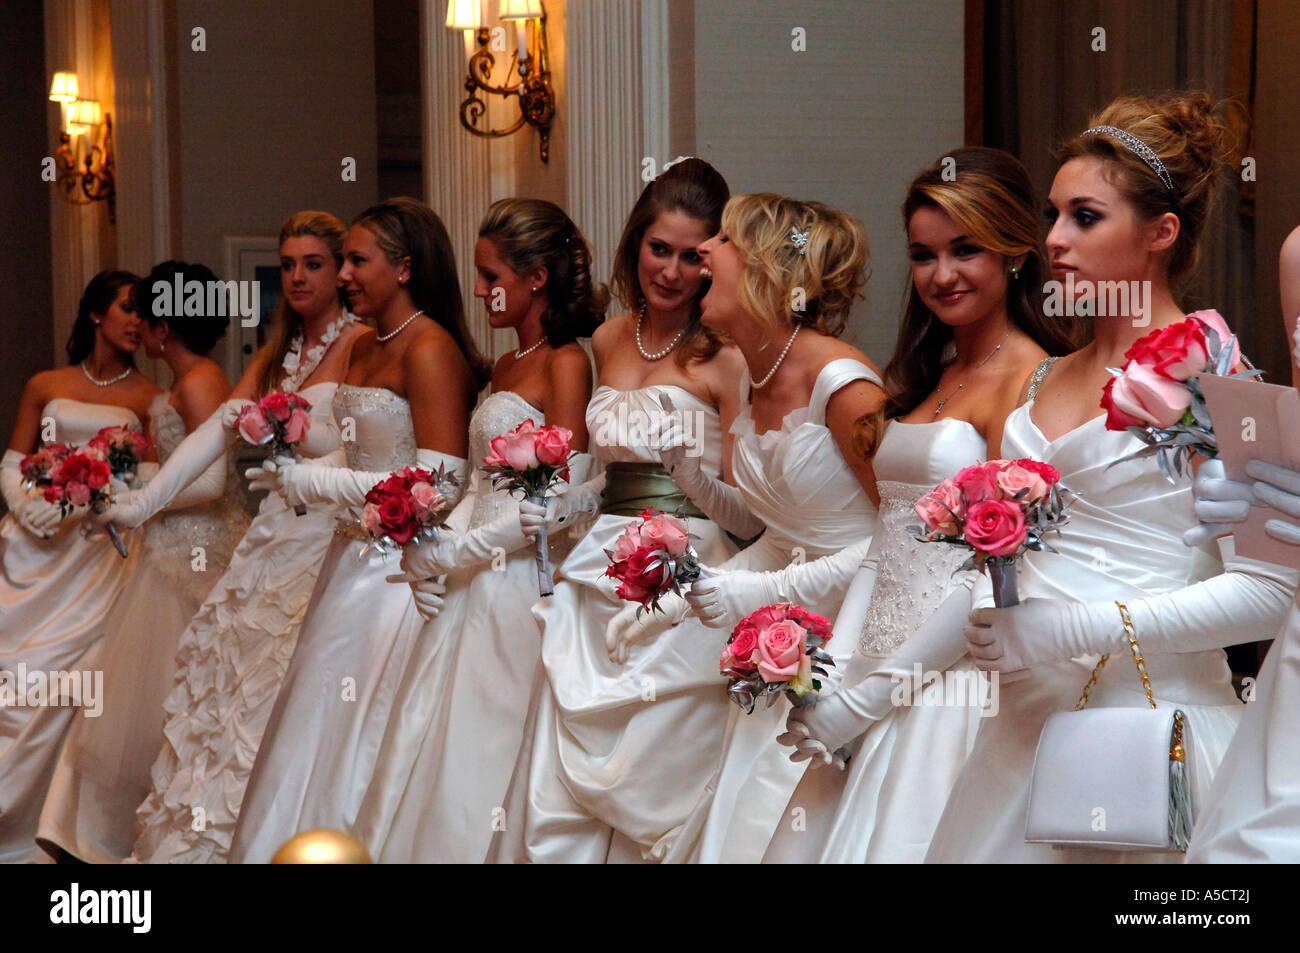 International Debutante Ball ... The receiving line at the 52nd International Debutante Ball at the Waldorf Astoria Hotel in NYC